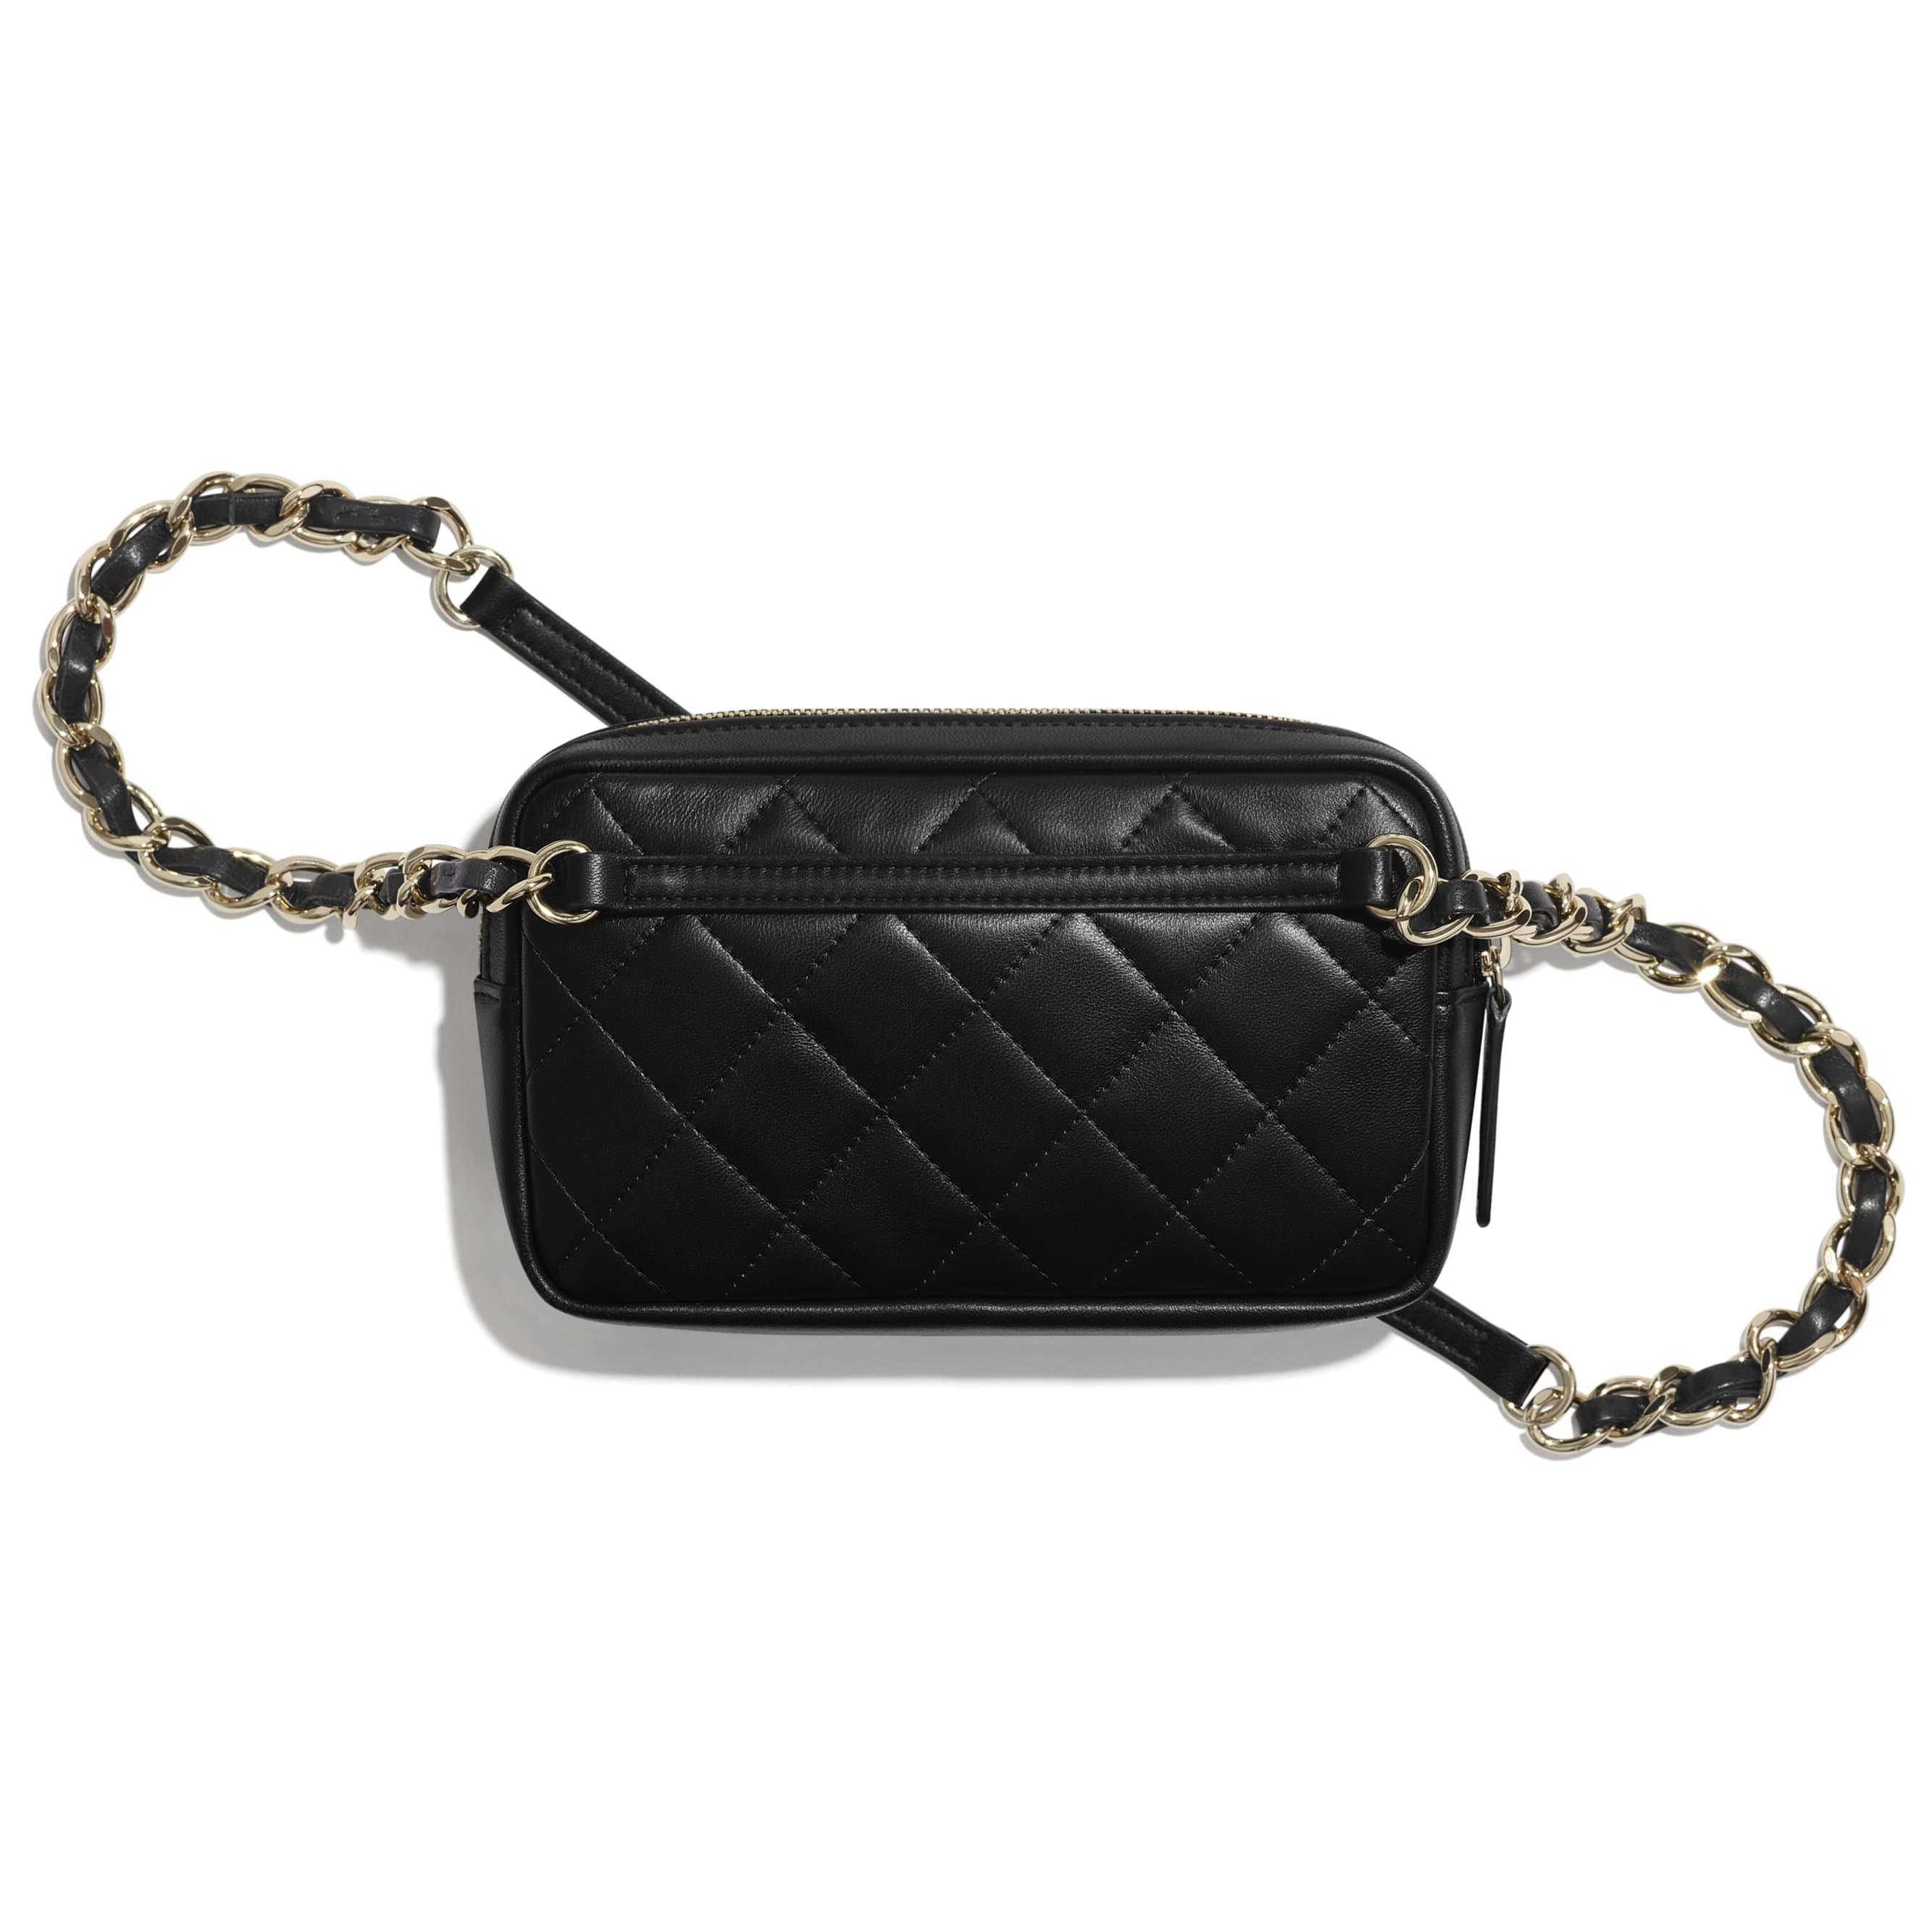 Waist bag - Black - Lambskin & Gold-Tone Metal - CHANEL - Alternative view - see standard sized version